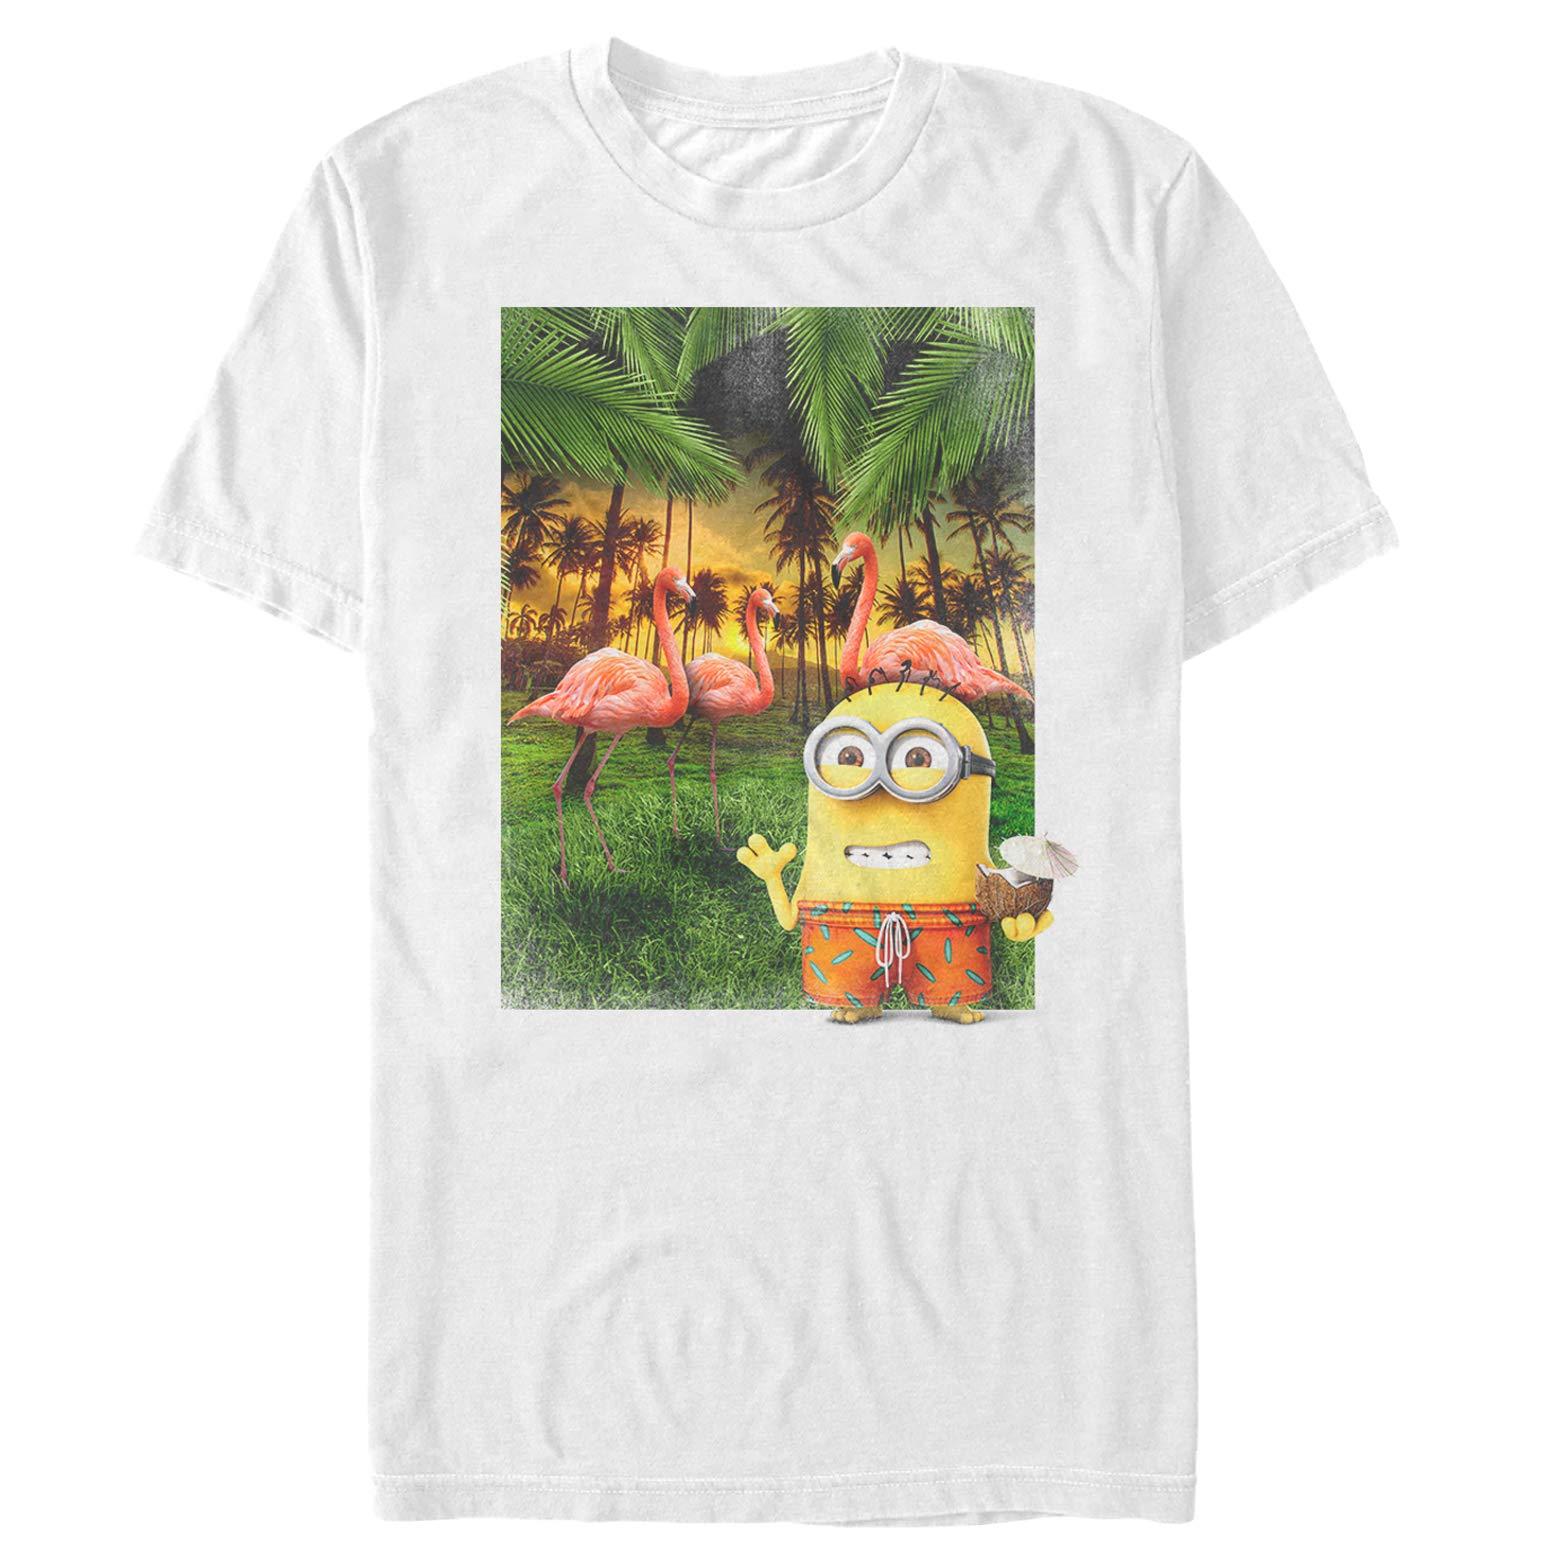 Despicable Me Minion Flamingo Vacation T Shirt 3109